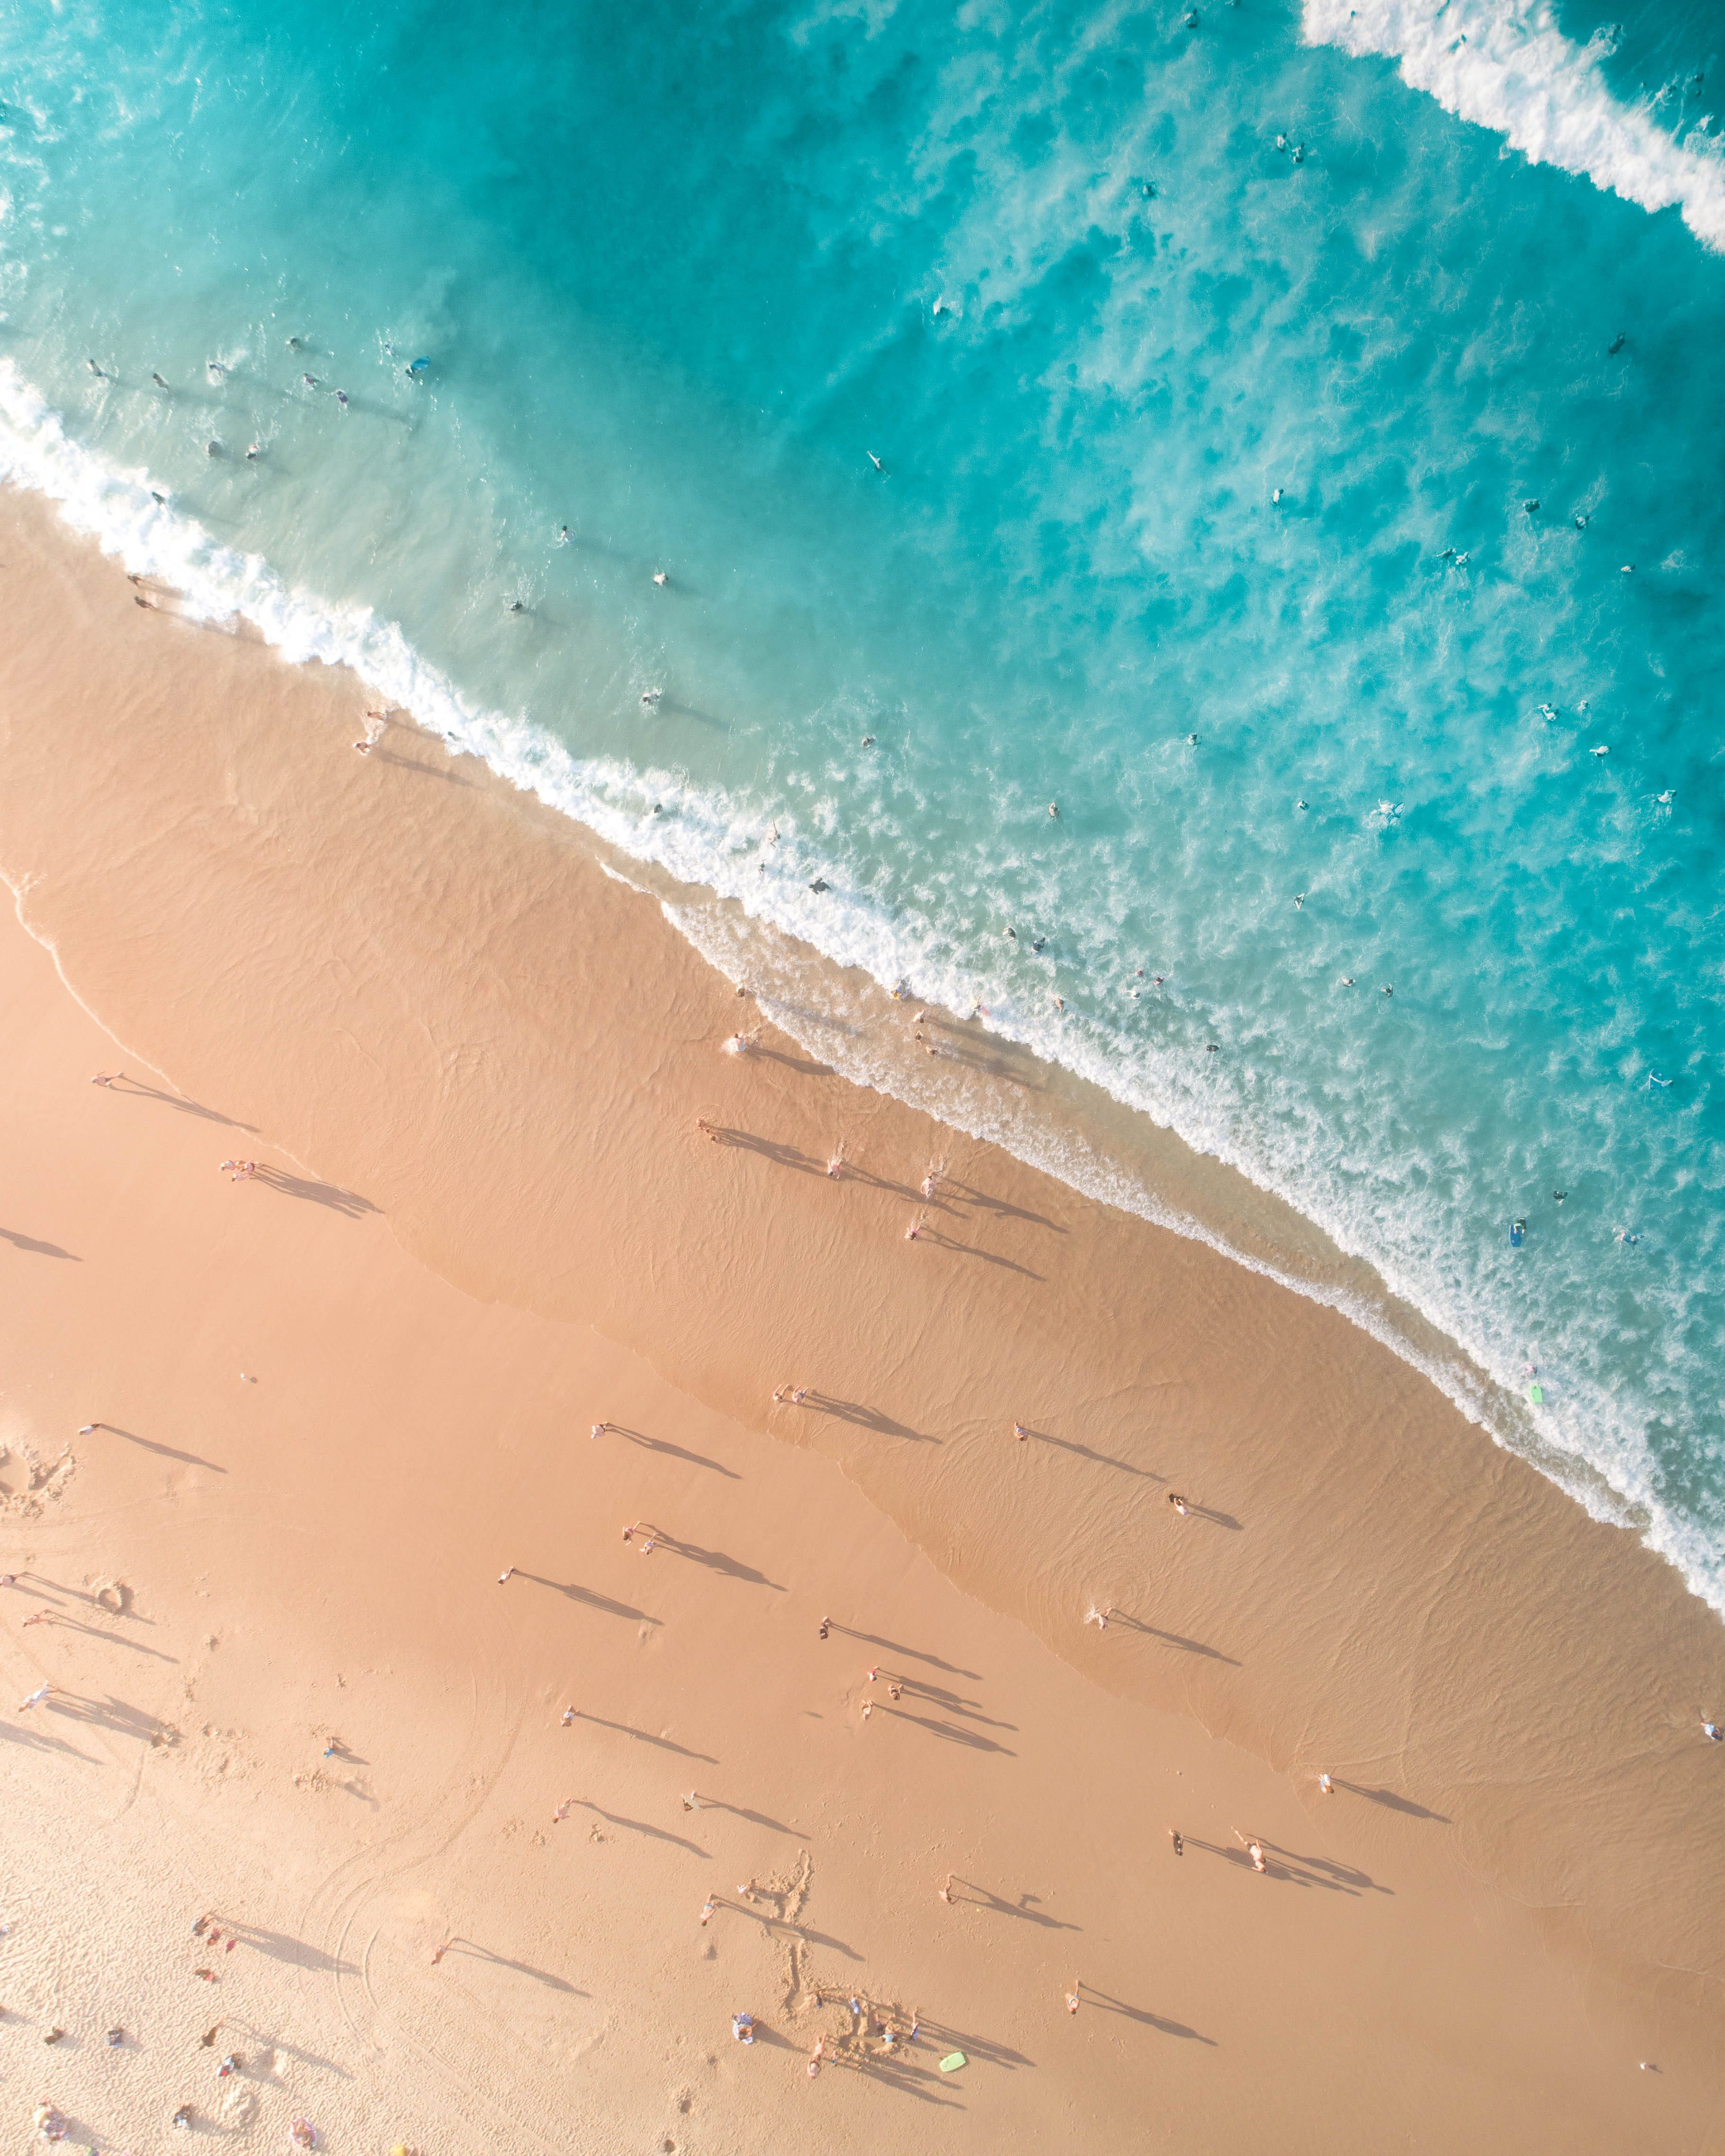 Aerial Photo Of Sea Aerial Photography Aerial Shot Beach Bird S Eye View Bondi Bondi Beach Daylight Drone Foot Landscape Wallpaper Beach Photos Hd Landscape